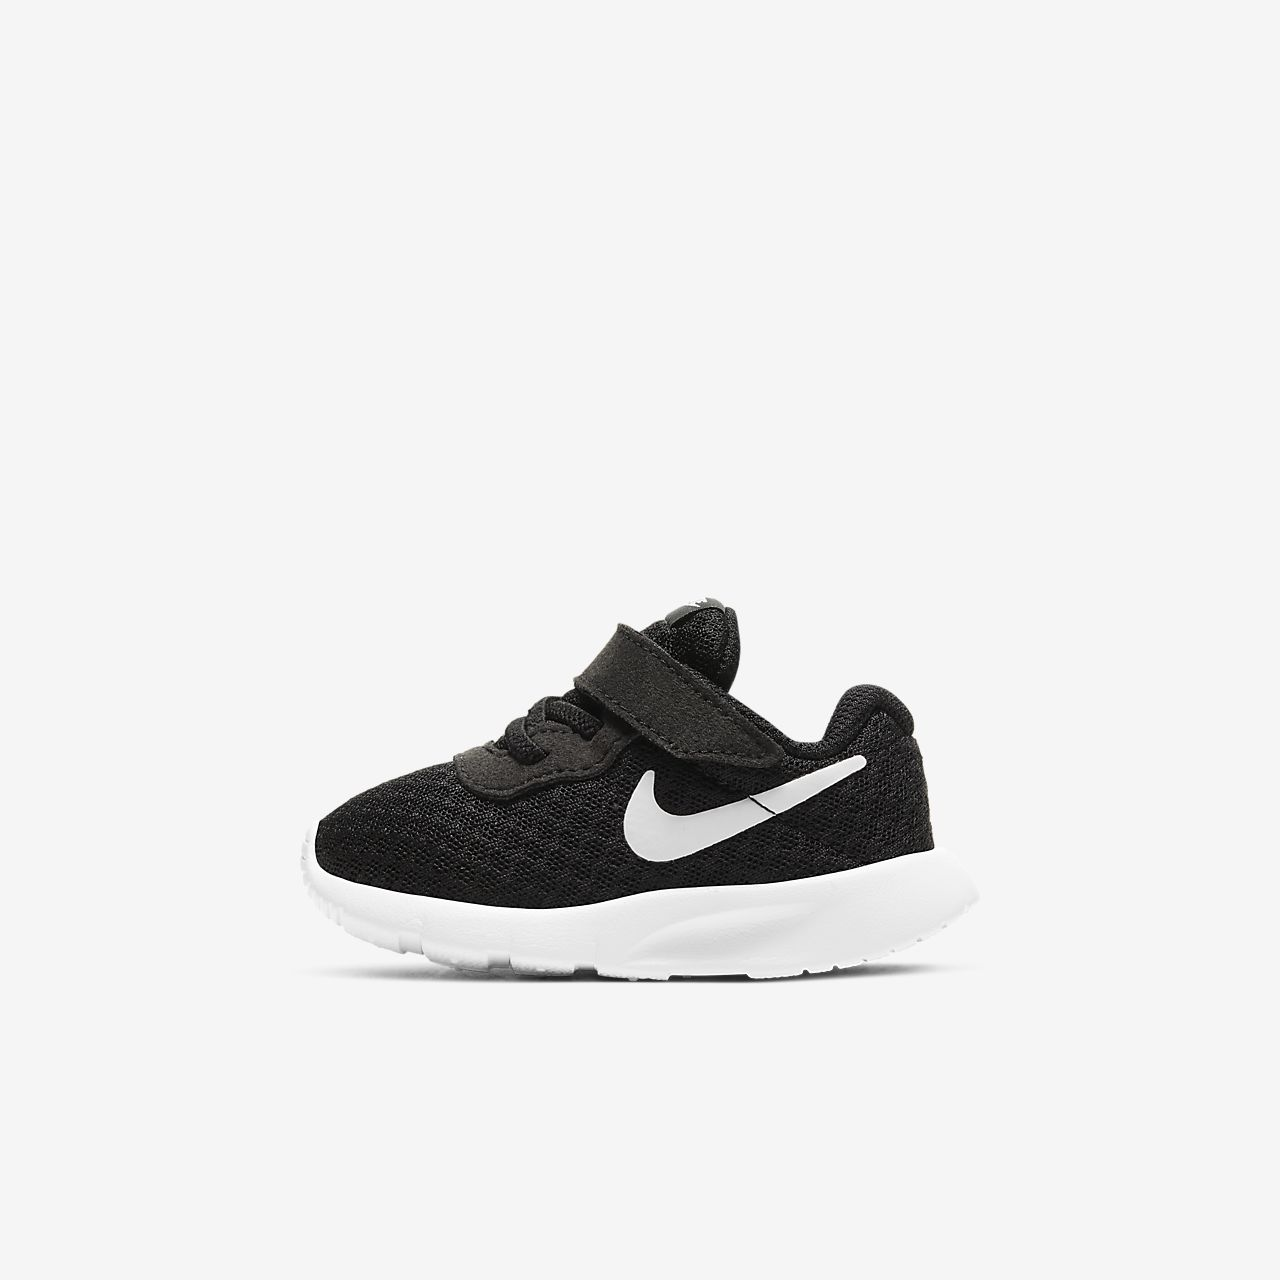 658d11e3e976f Nike Tanjun (1.5-9.5) Baby & Toddler Shoe